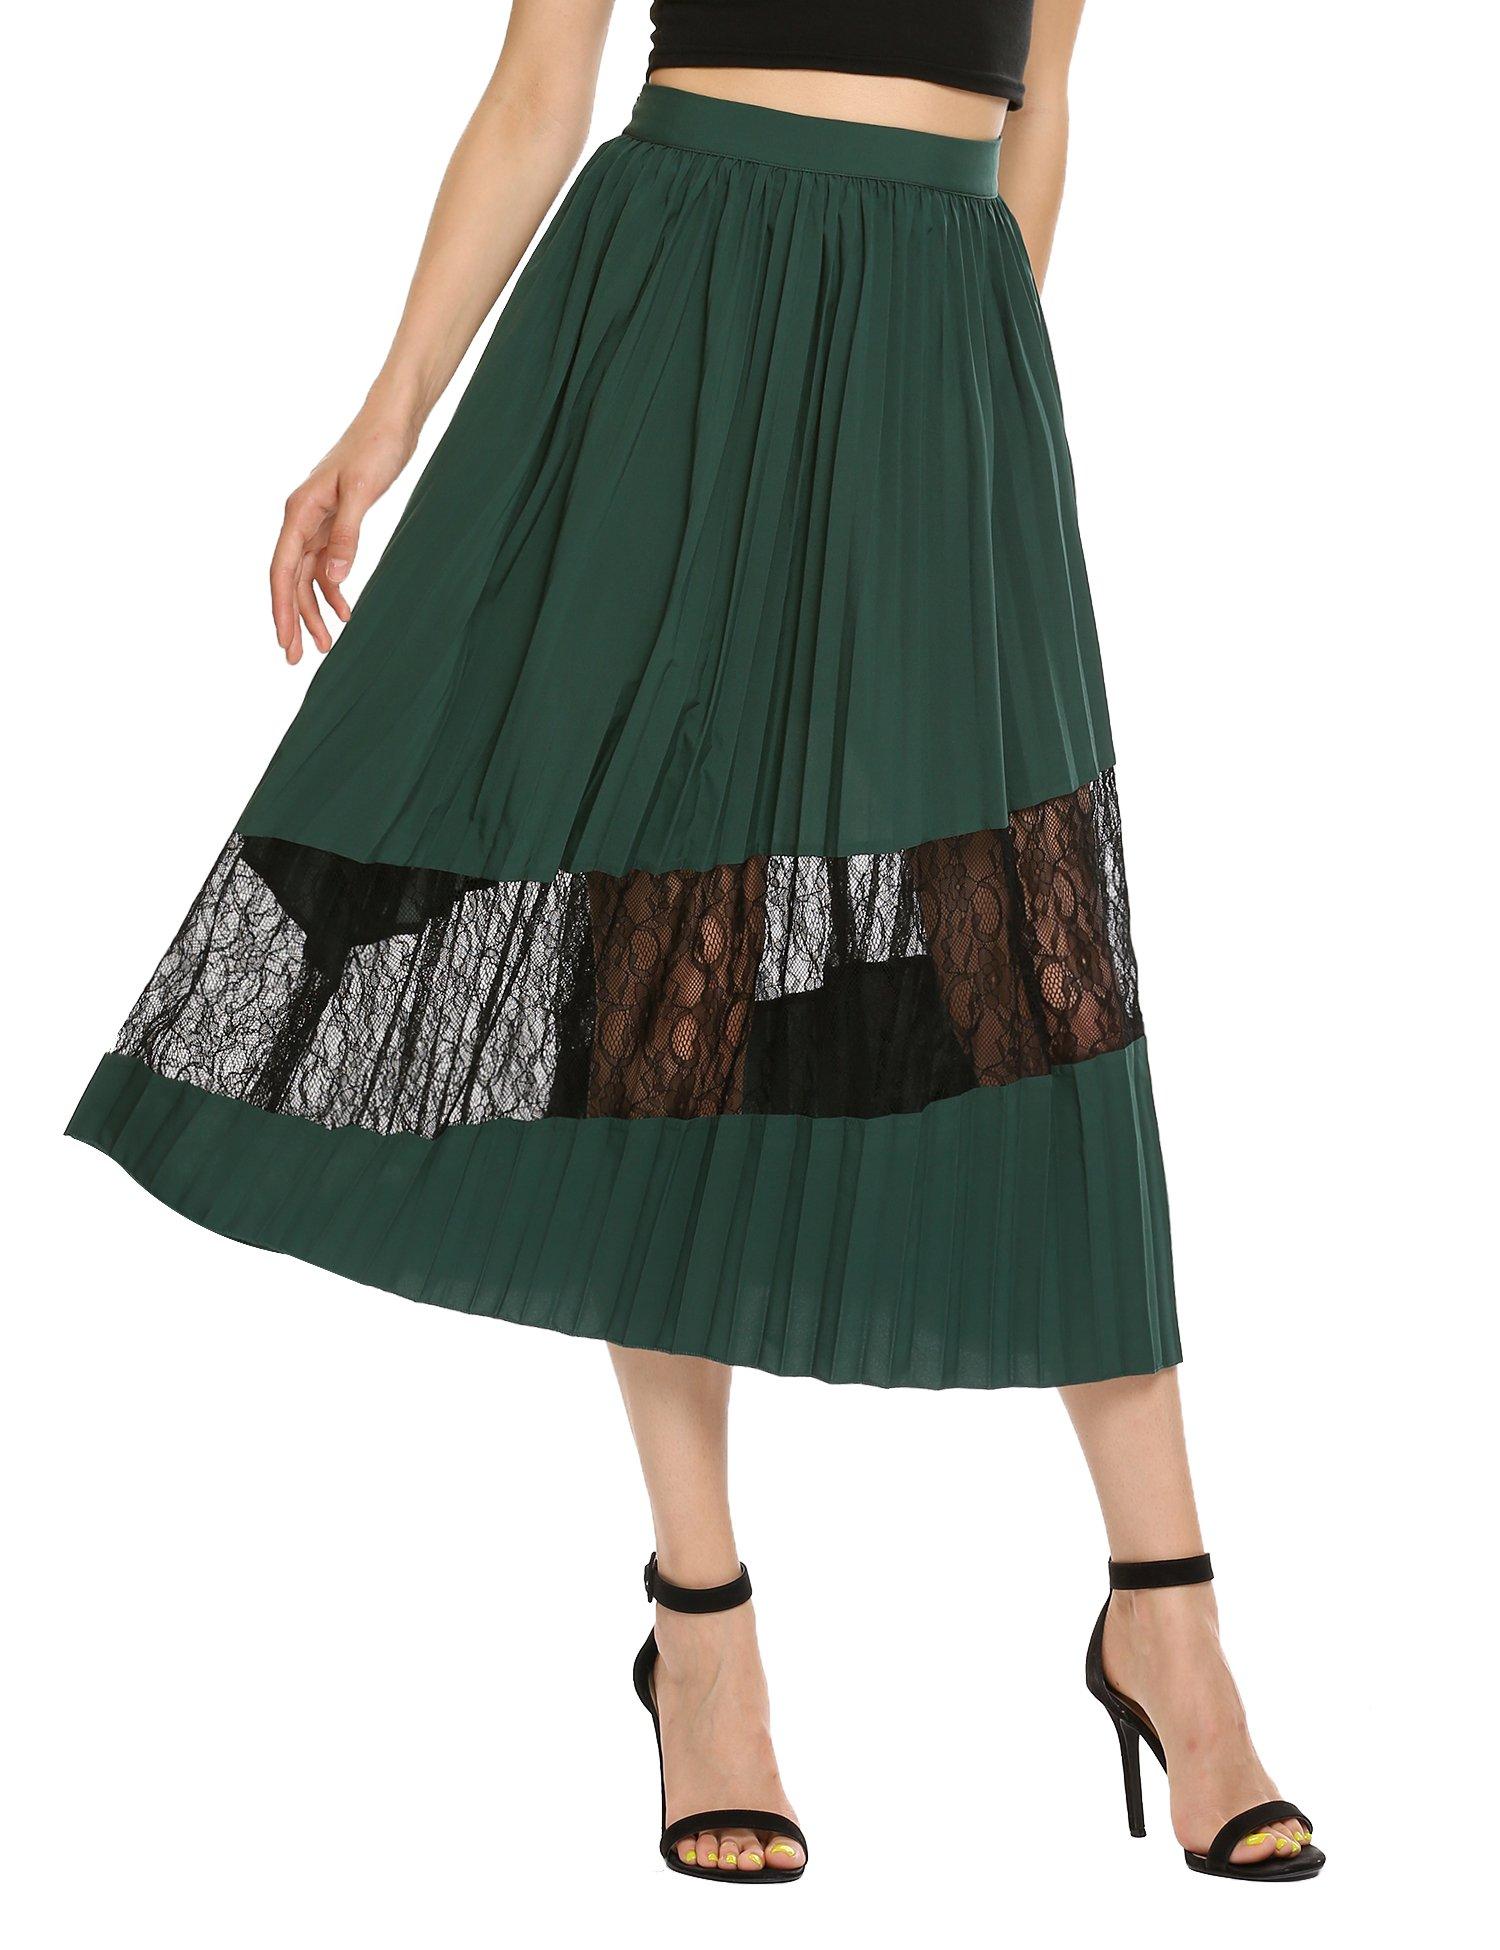 Zeagoo Women's Chiffon Lace Stitching Pleated Skirt Dark Green S